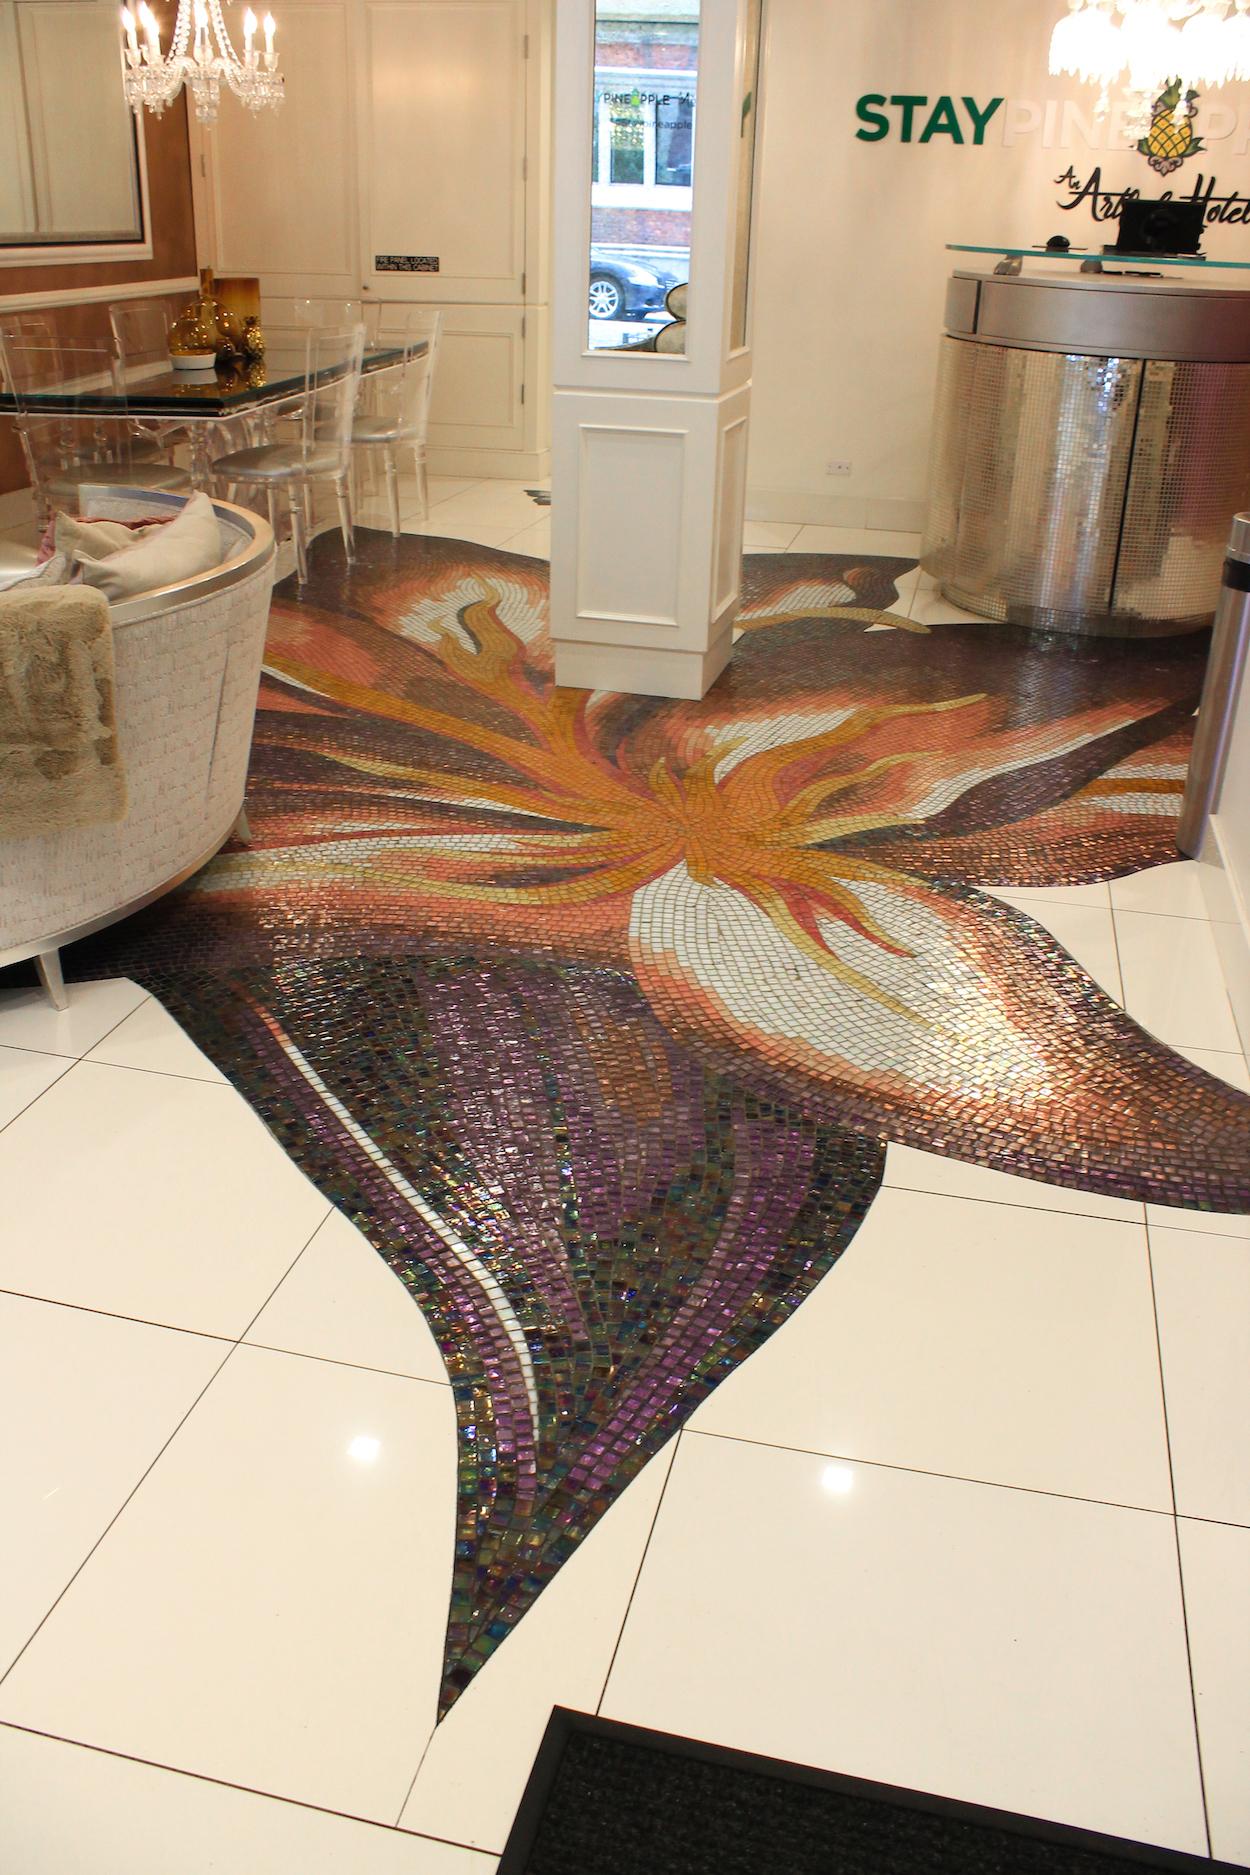 The floor at StayPineapple Hotel New York